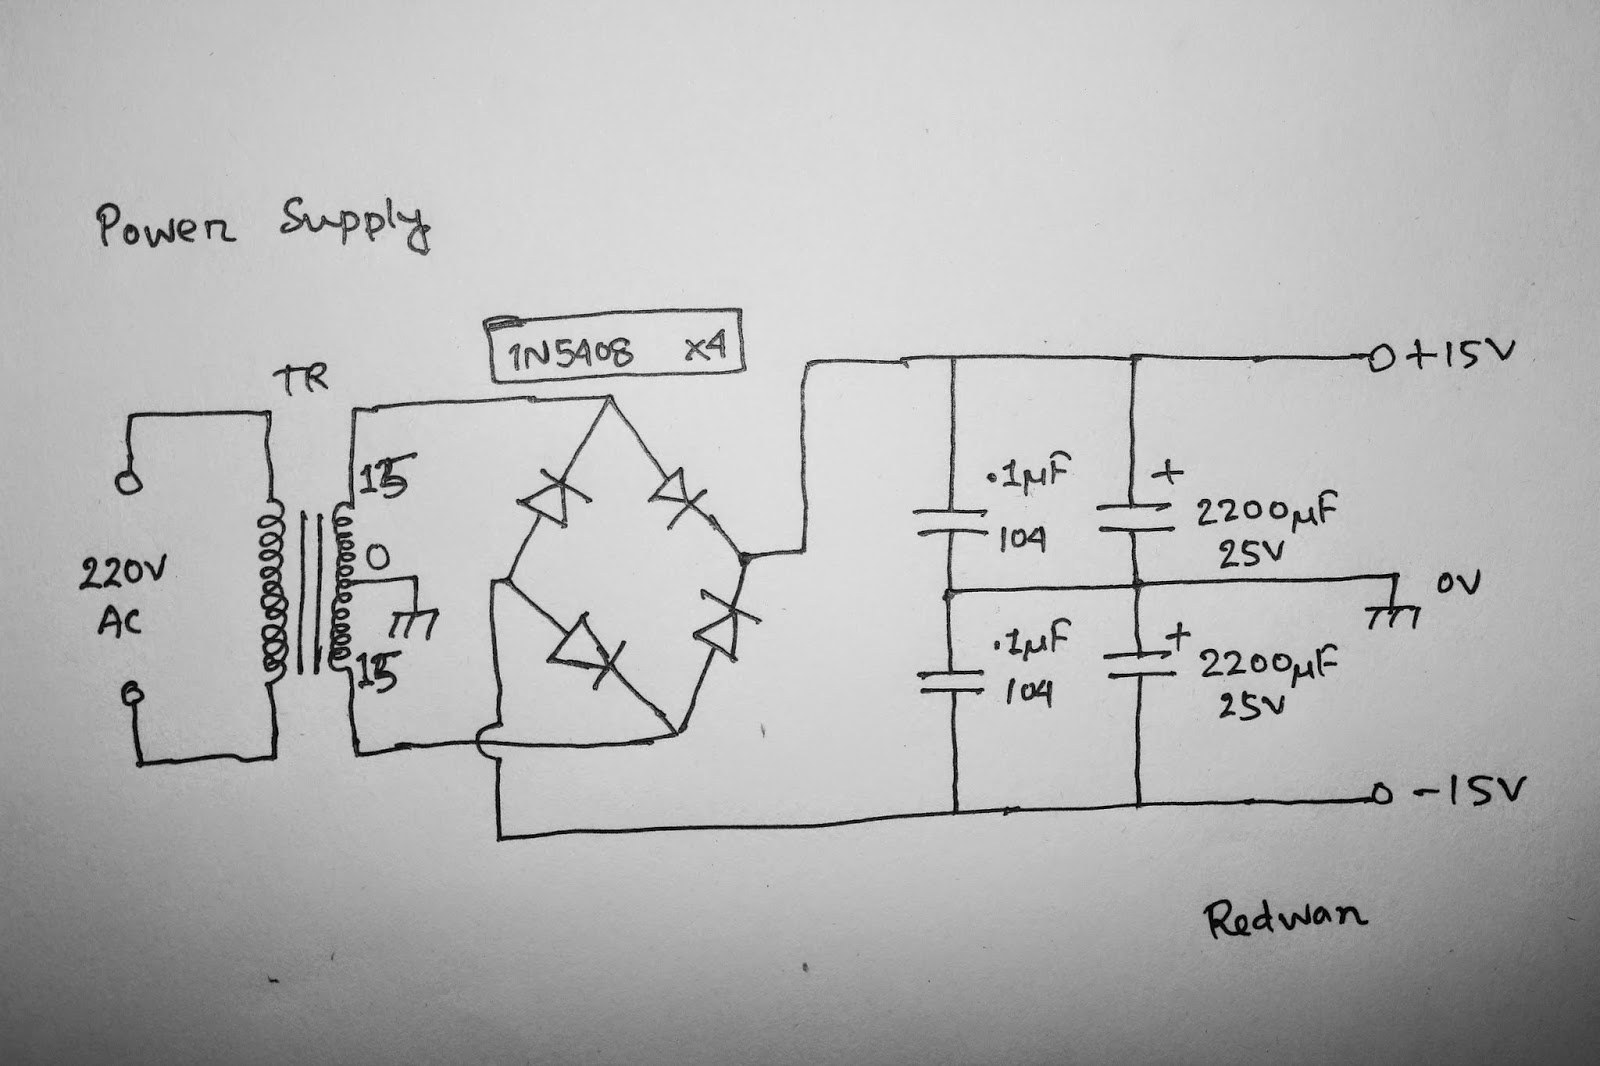 Scavengers Blog 10w Mono Amplifier With Tda 2030 Schematic Audio Ic Tda2030